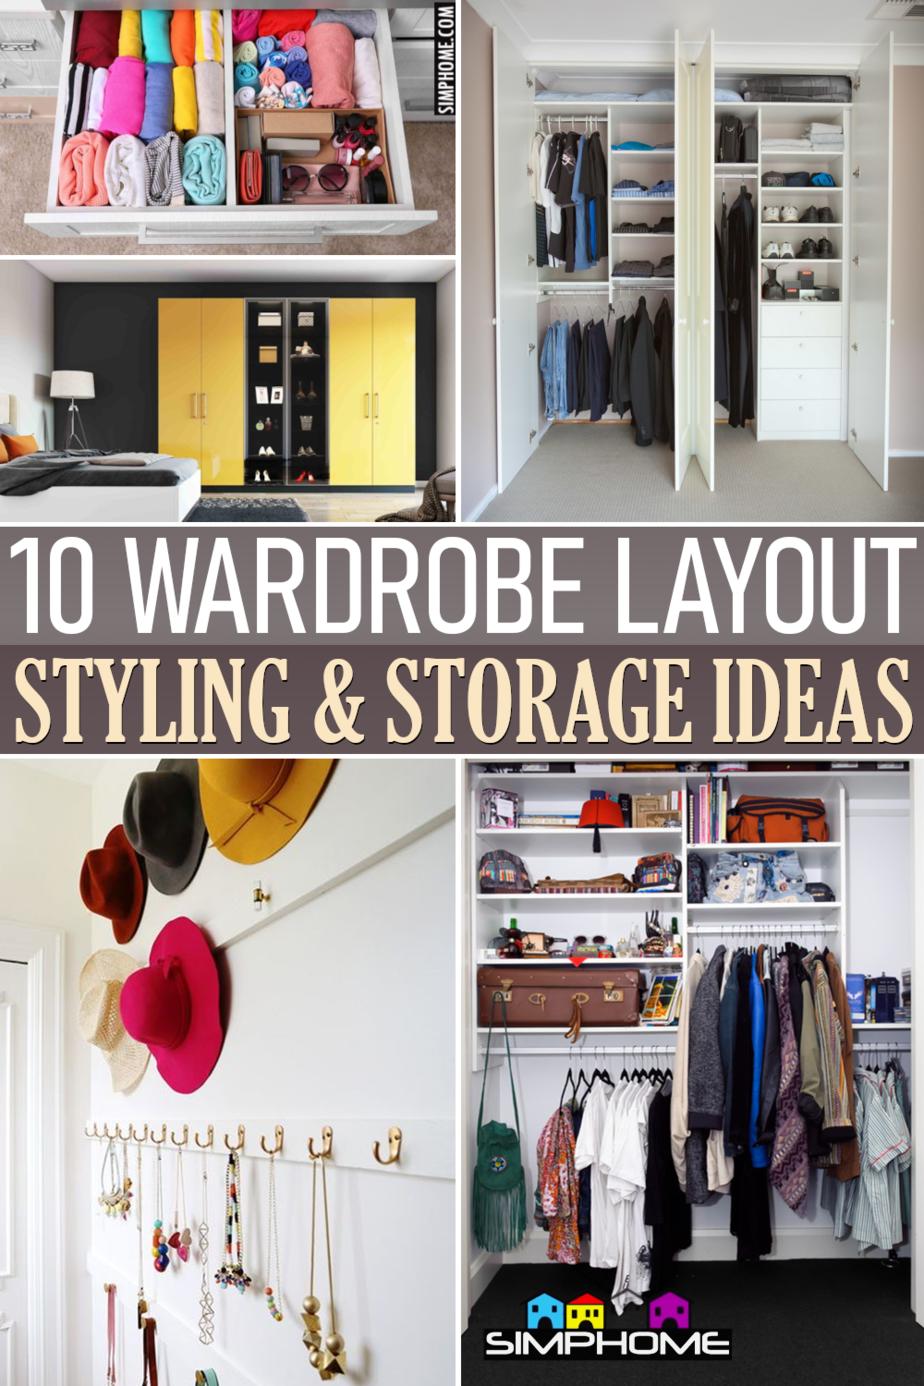 10 Wardrobe Layout Storage Ideas via Simphome.comFeatured